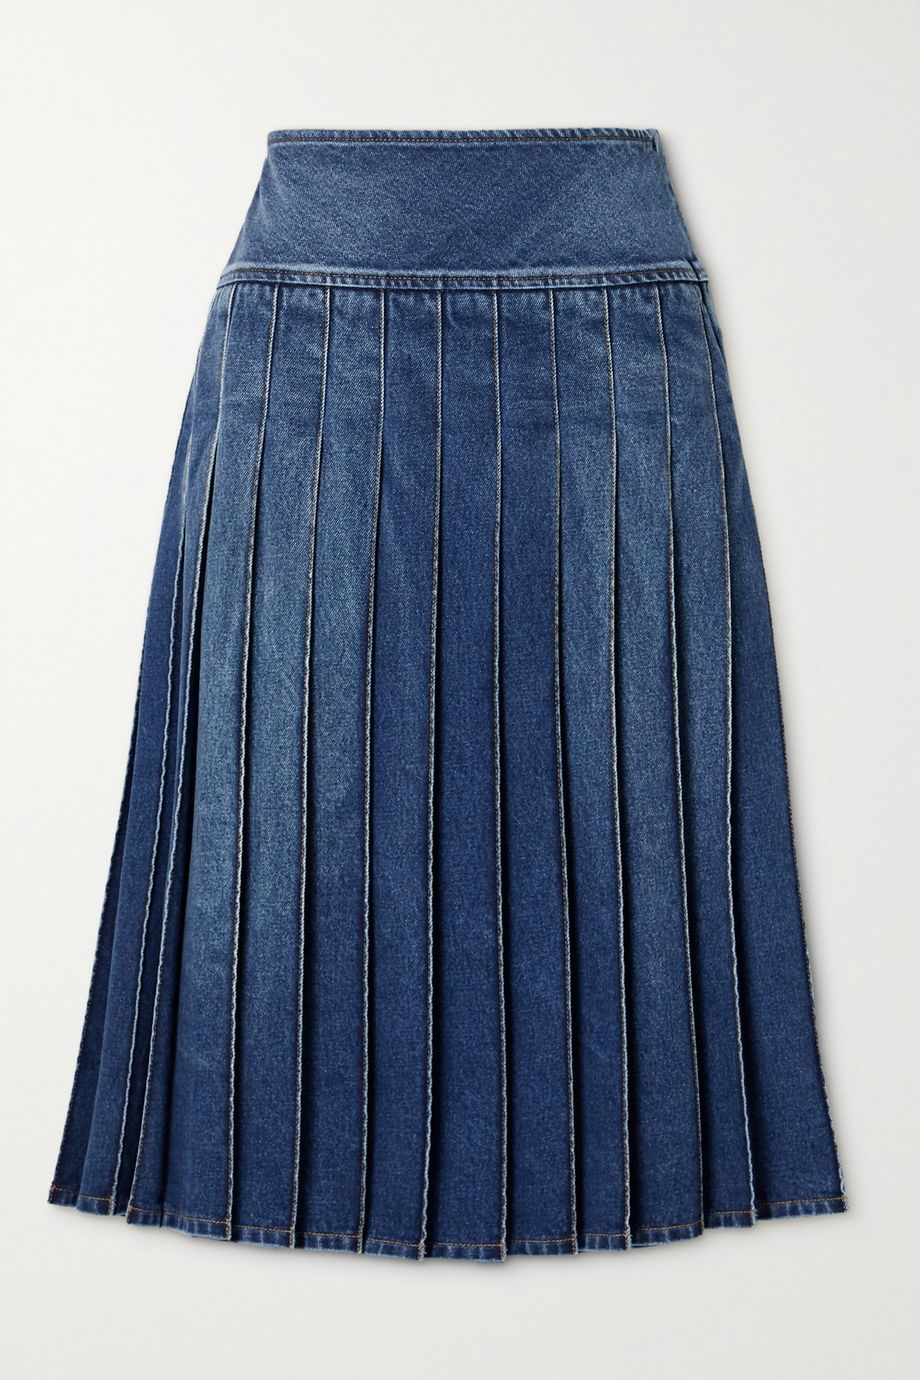 Michael Kors Collection Pleated denim midi skirt